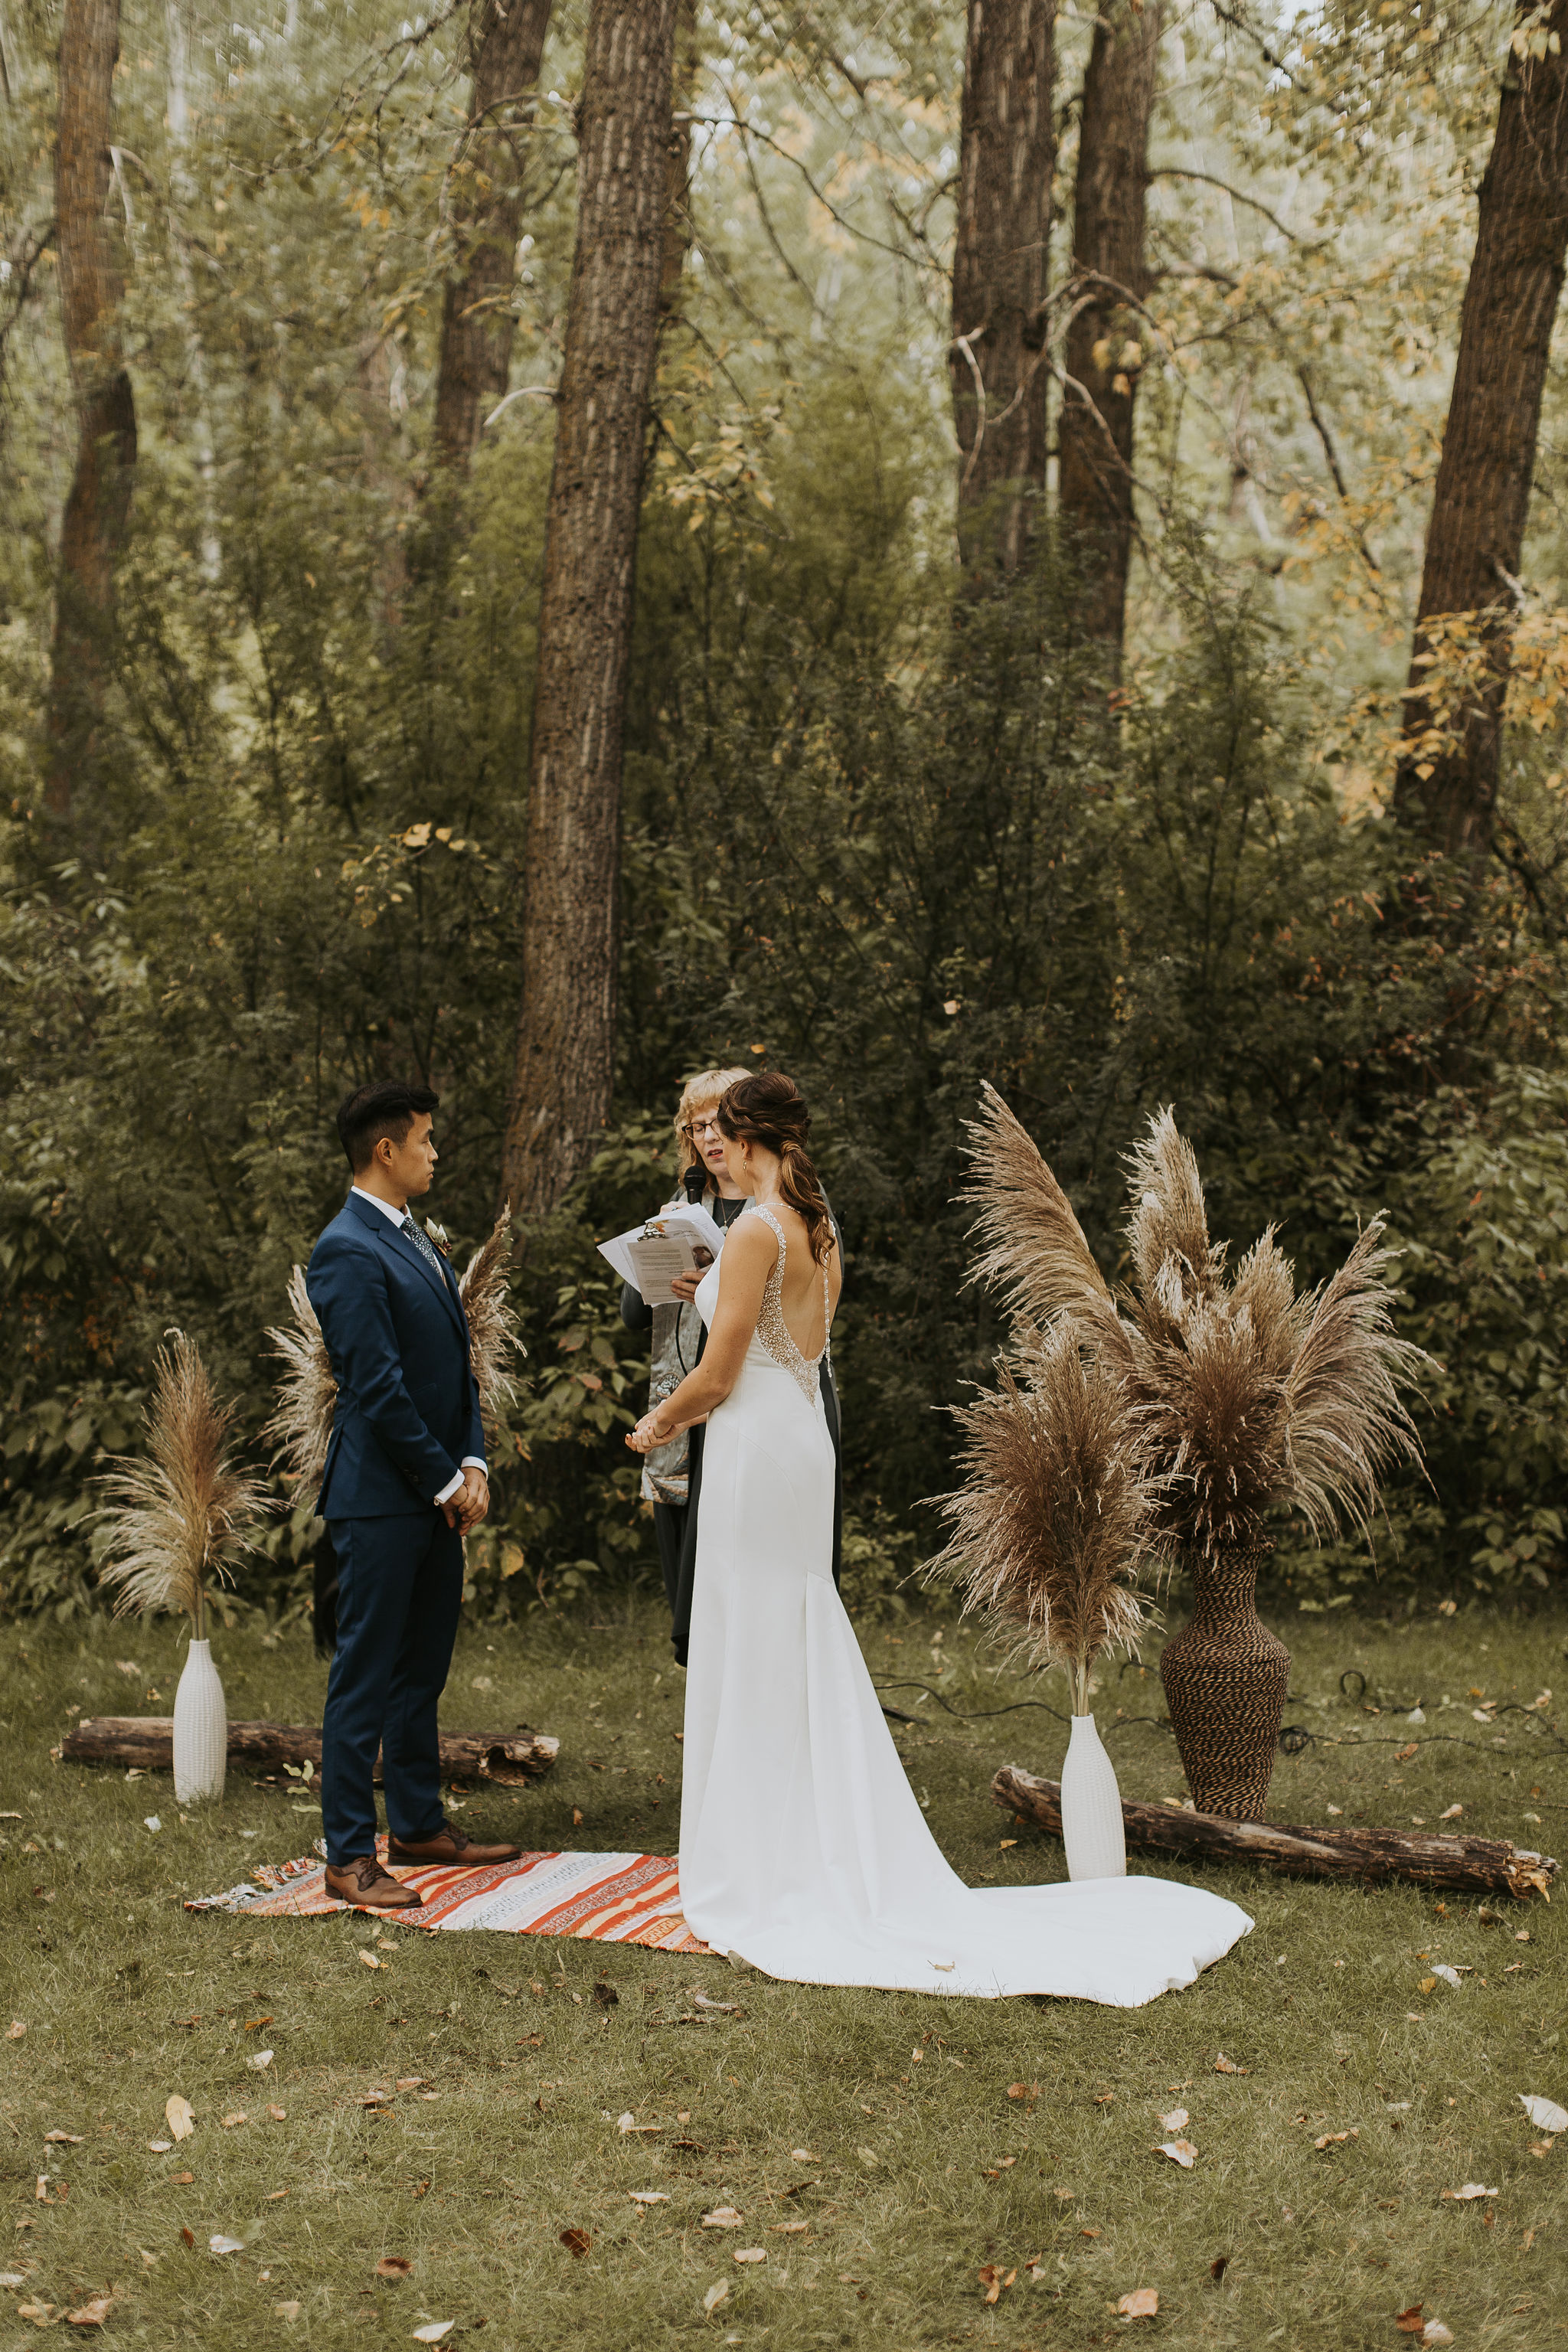 AK_Wedding_Ceremony-83.jpg